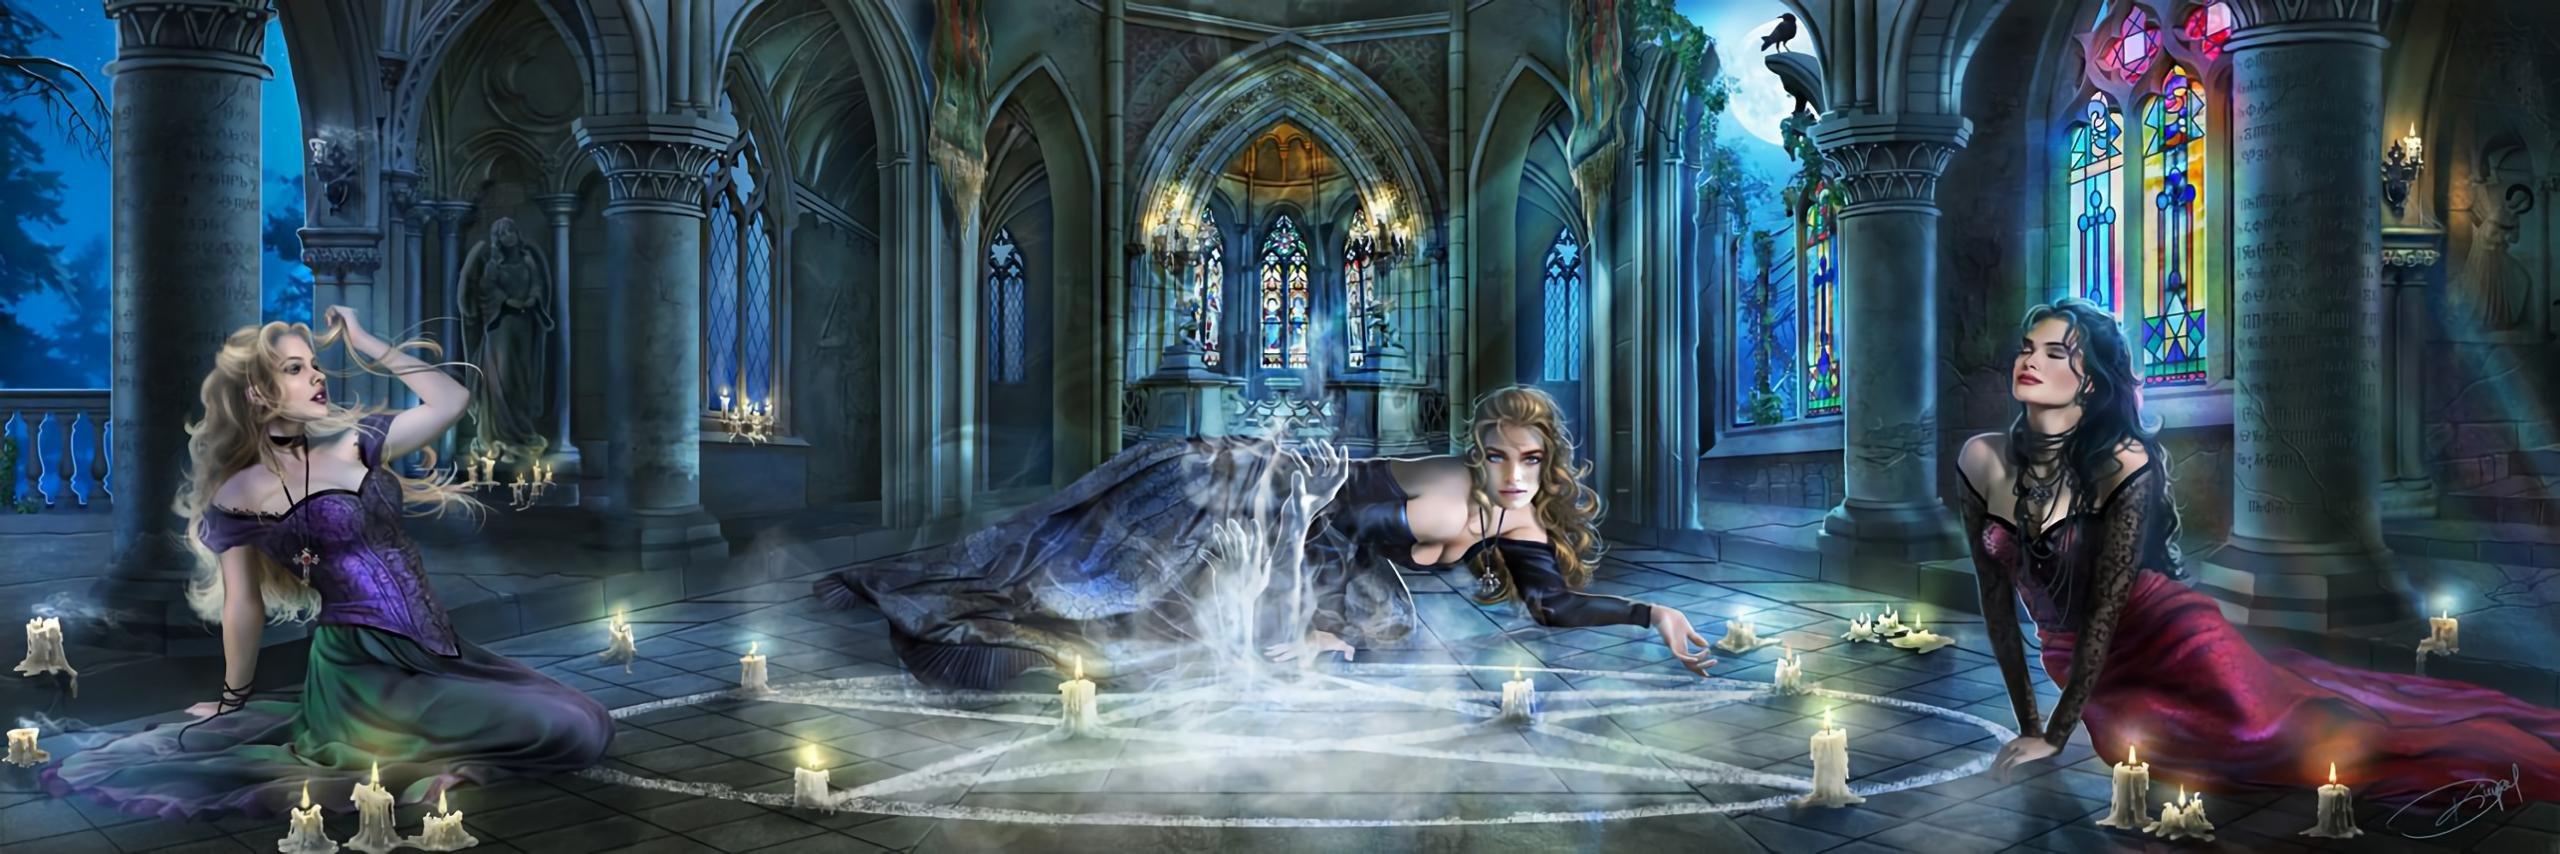 Fantasy Dual Monitor Wallpaper: Best Fantasy Girl Wallpaper ID:336731 For High Resolution